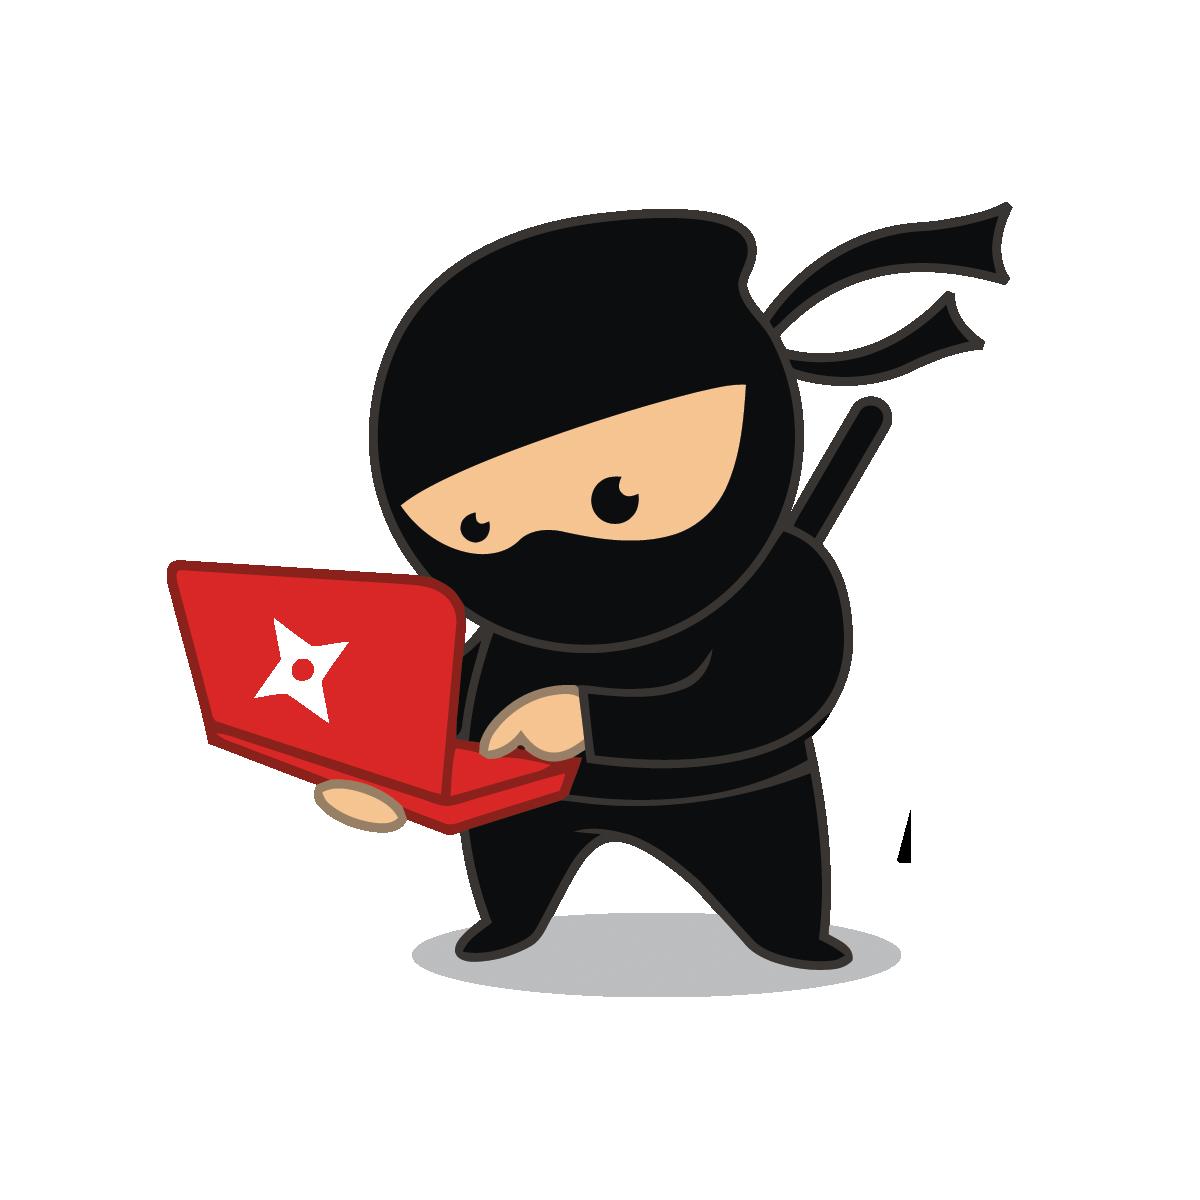 kisspng-ninja-computer-programming-learning-study-skills-avatar-5acd61df6f5765.9129322315234093754561.png